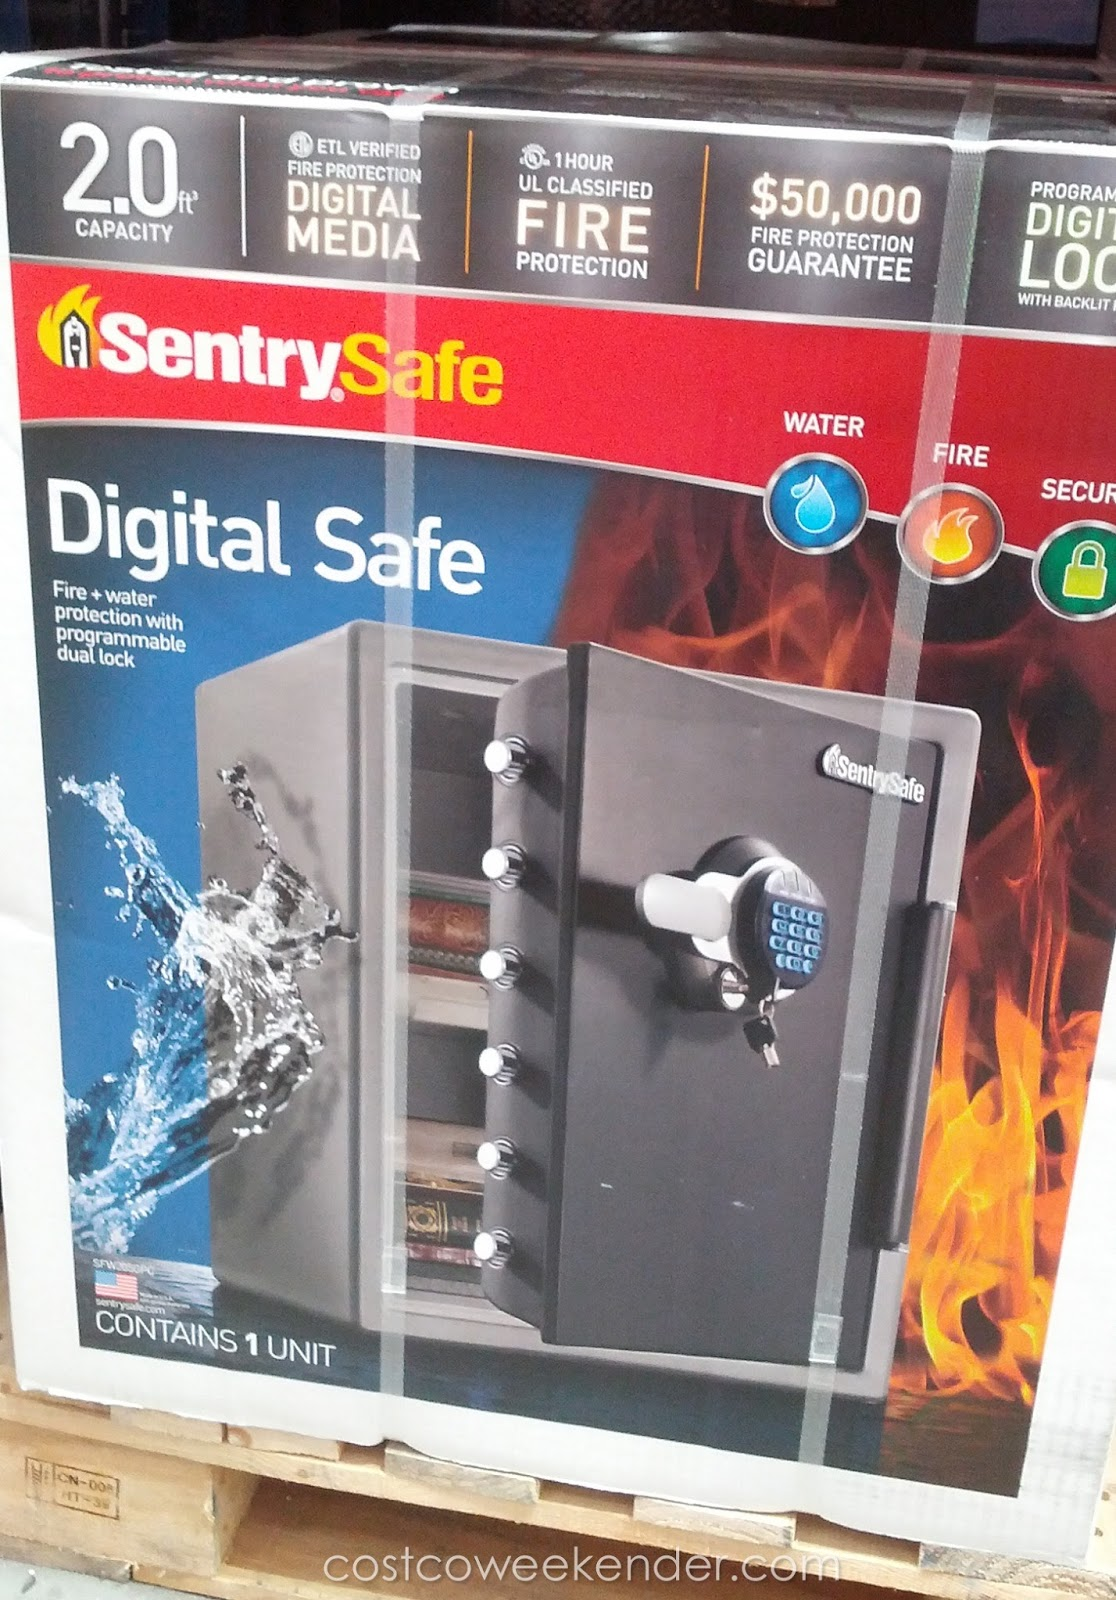 SentrySafe SFW205GPC Digital Safe | Costco Weekender